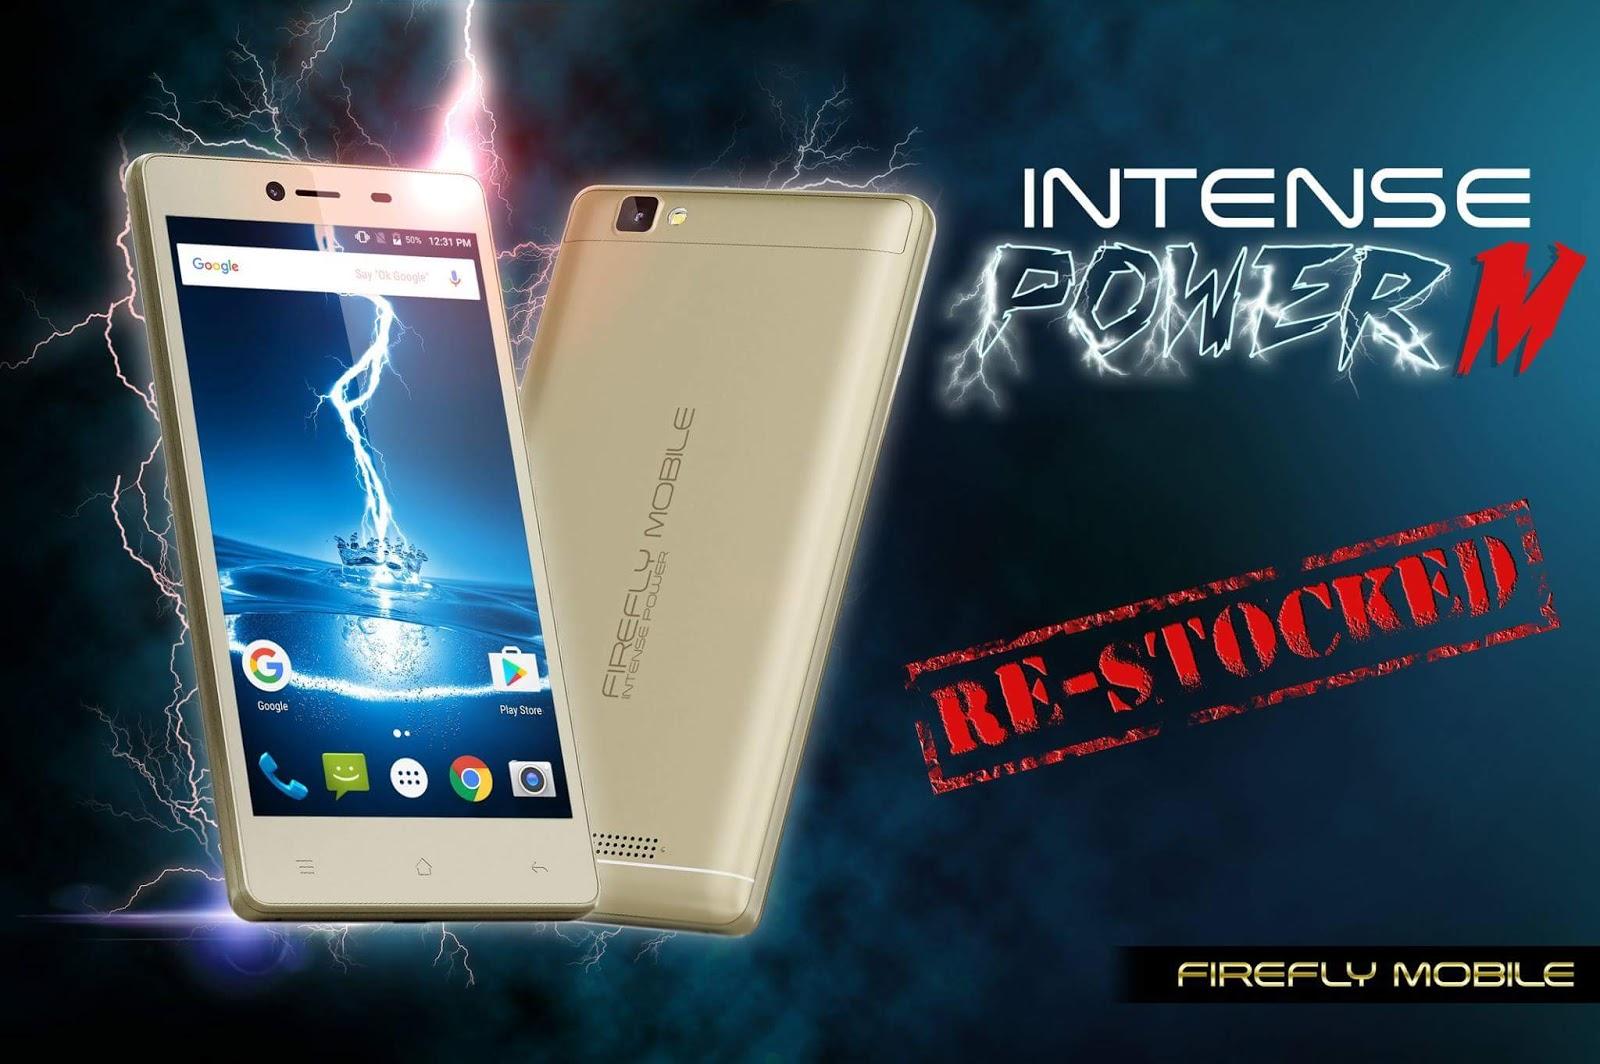 Firefly Mobile Intense Power M Revealed, same Intense Power